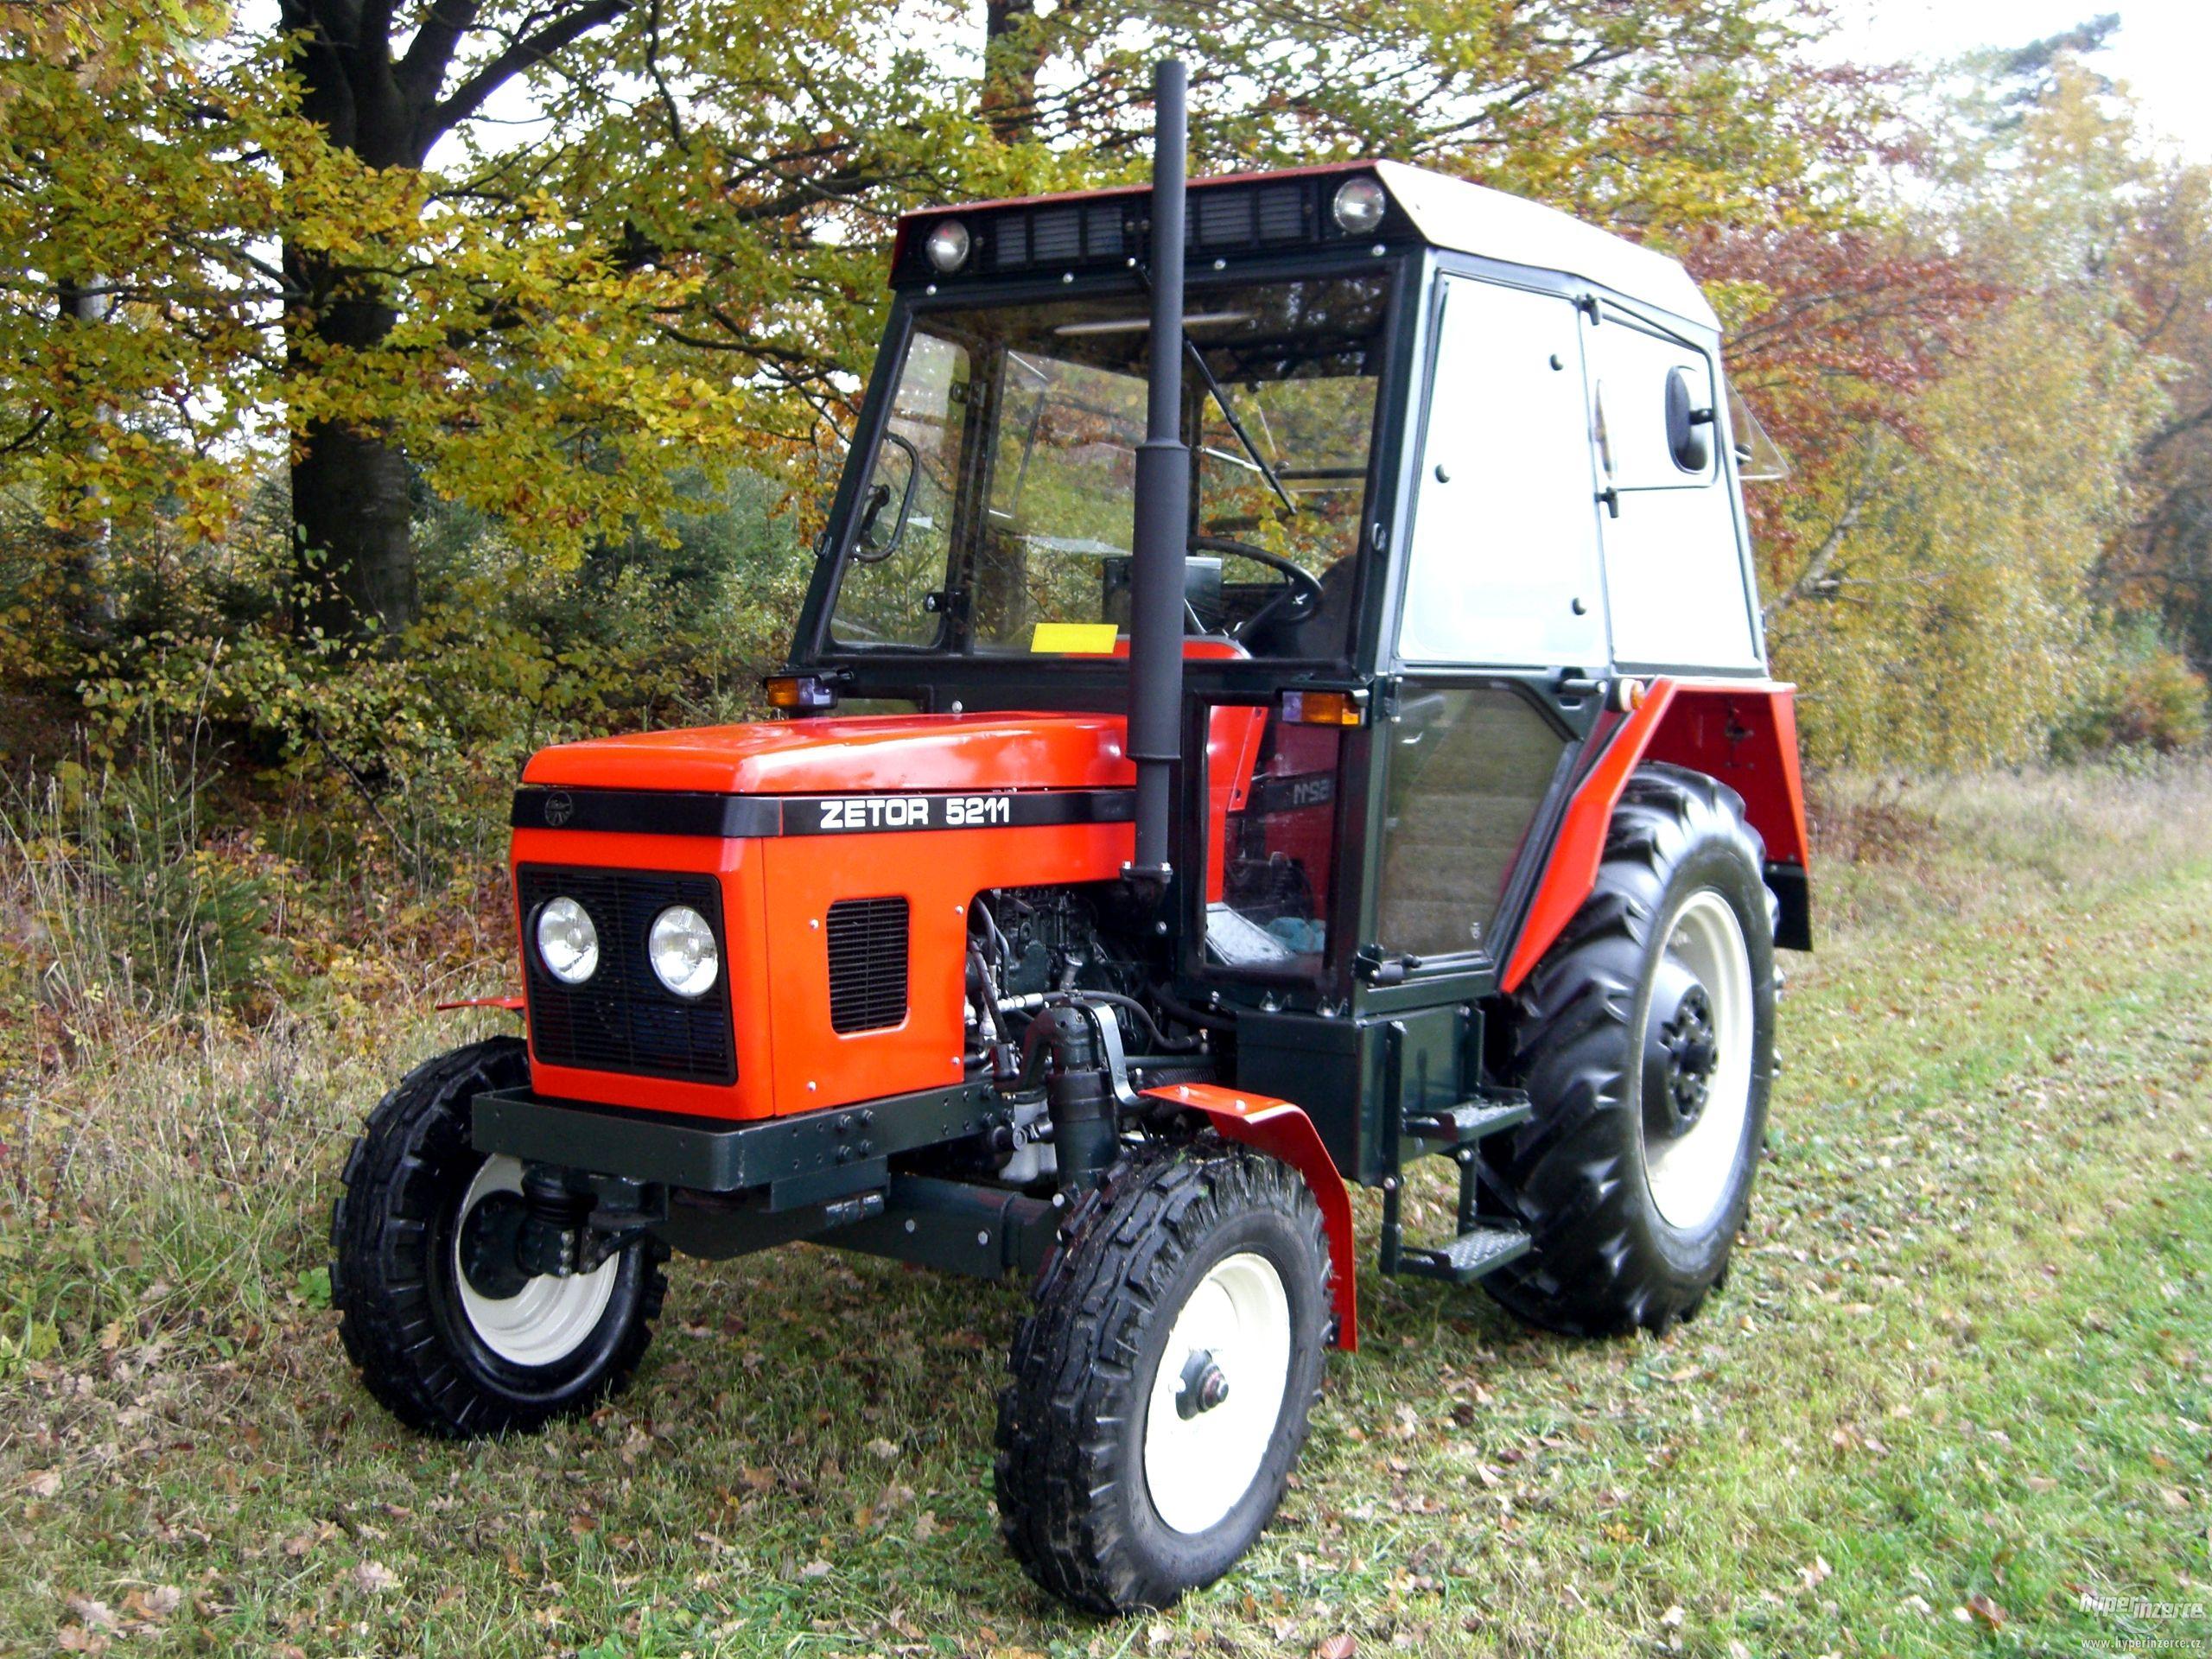 Zetor 5211 tractor diagram appghsr zetor 5211 tractor mania pinterest tractor rh pinterest co uk 6245 zetor tractor parts zetor 5211 asfbconference2016 Choice Image